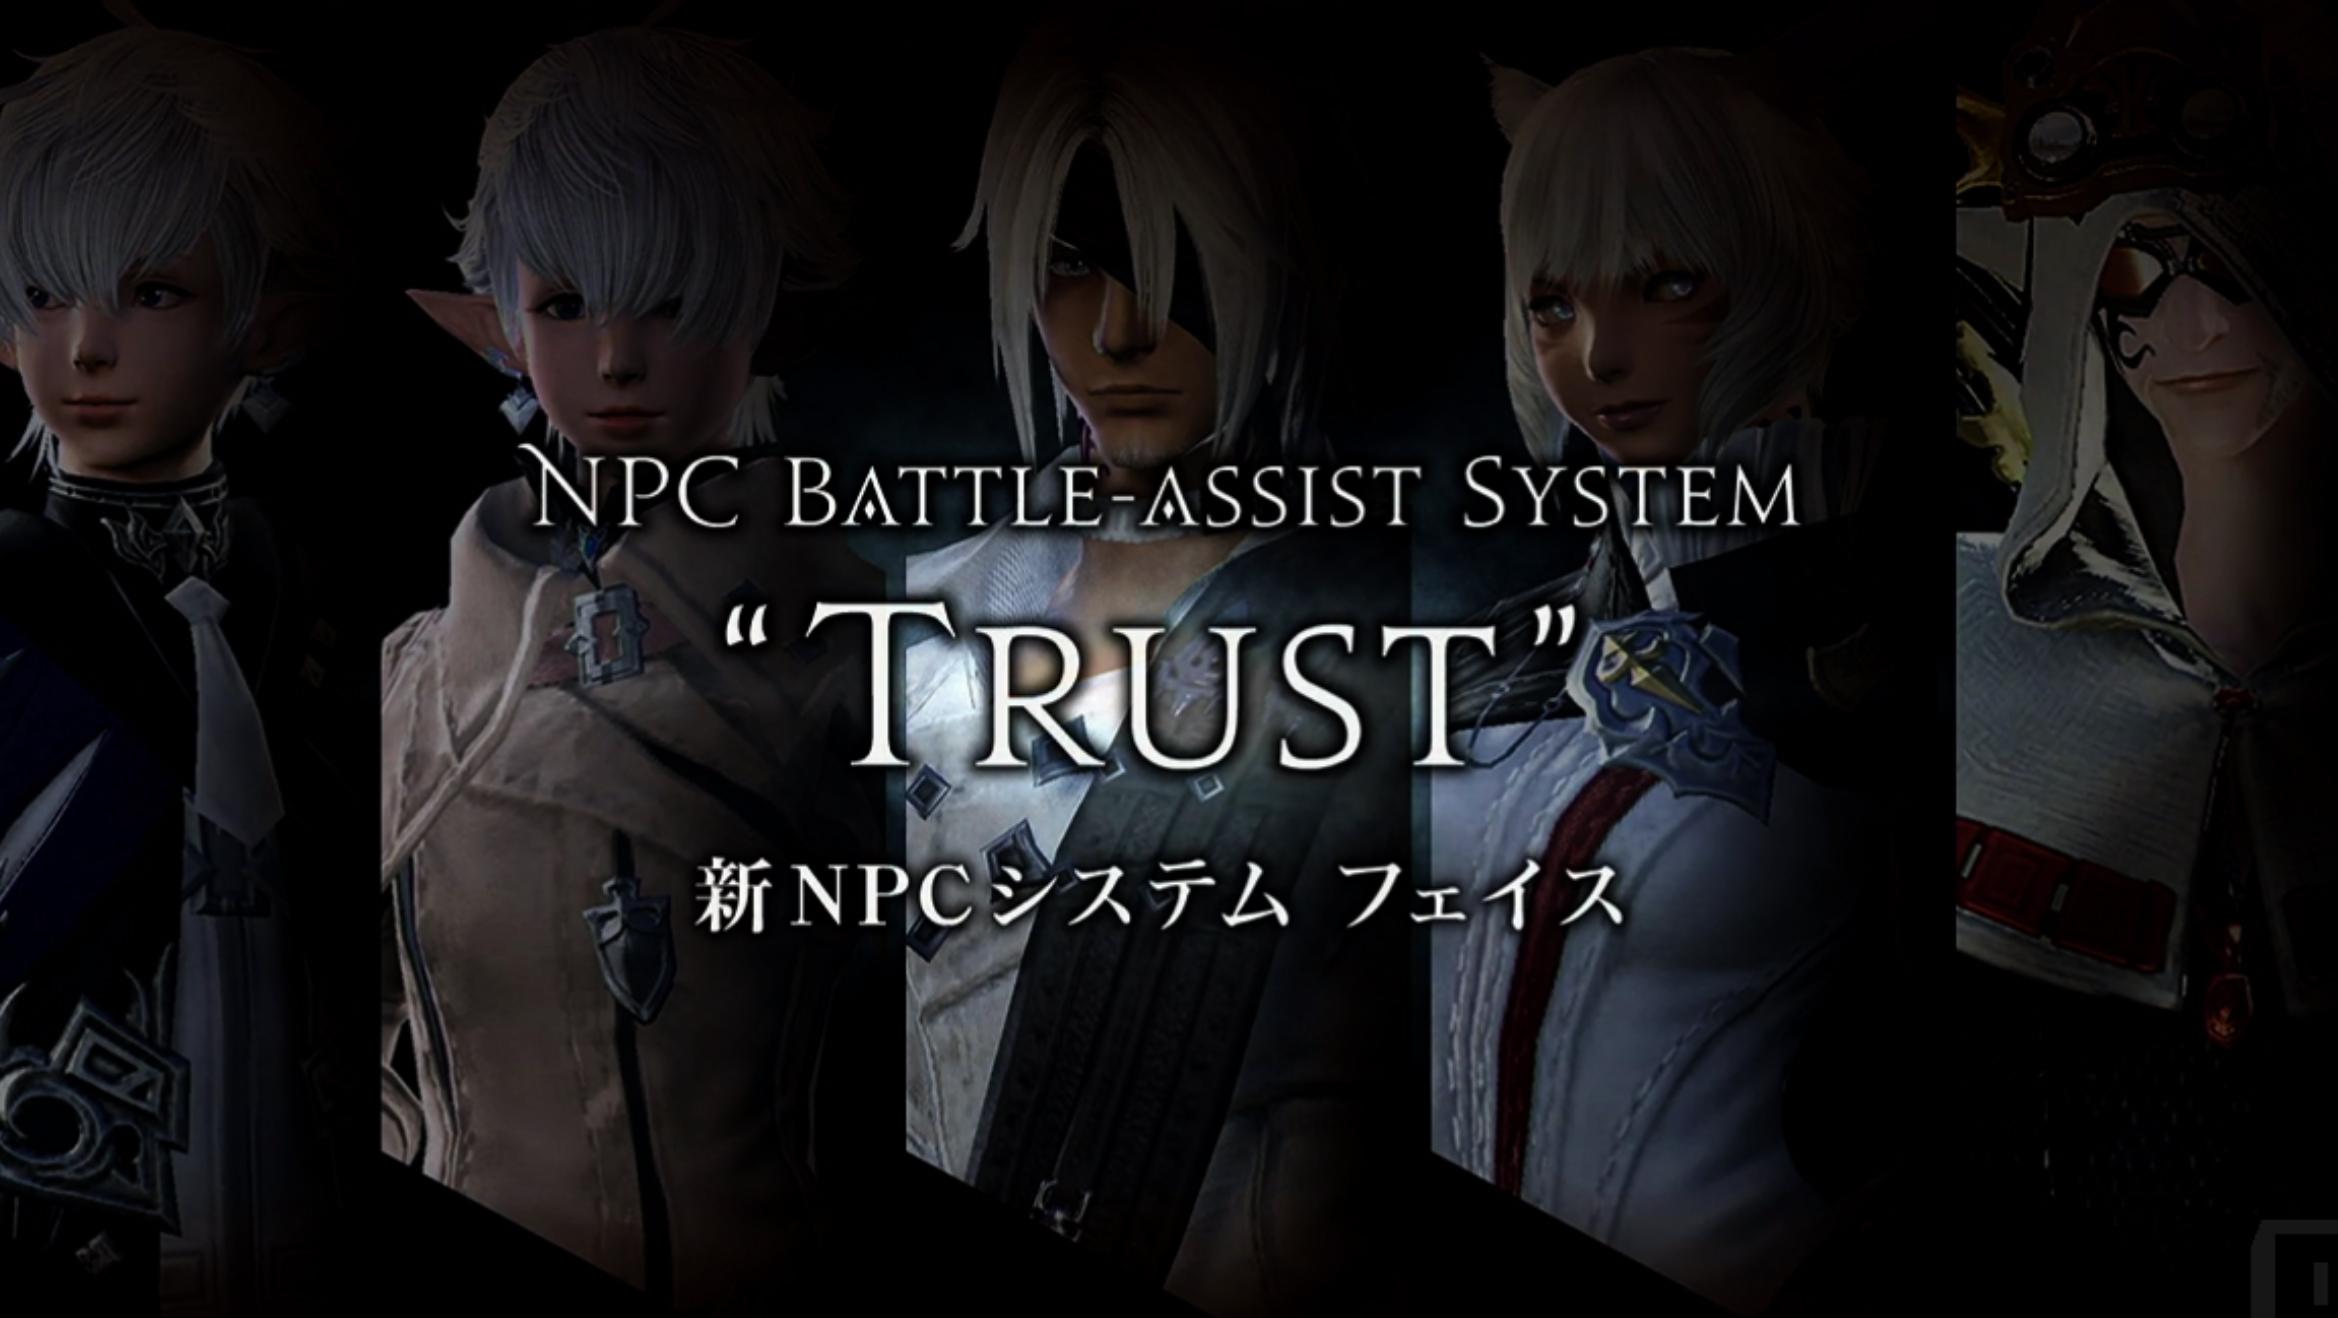 FFXIV Trust